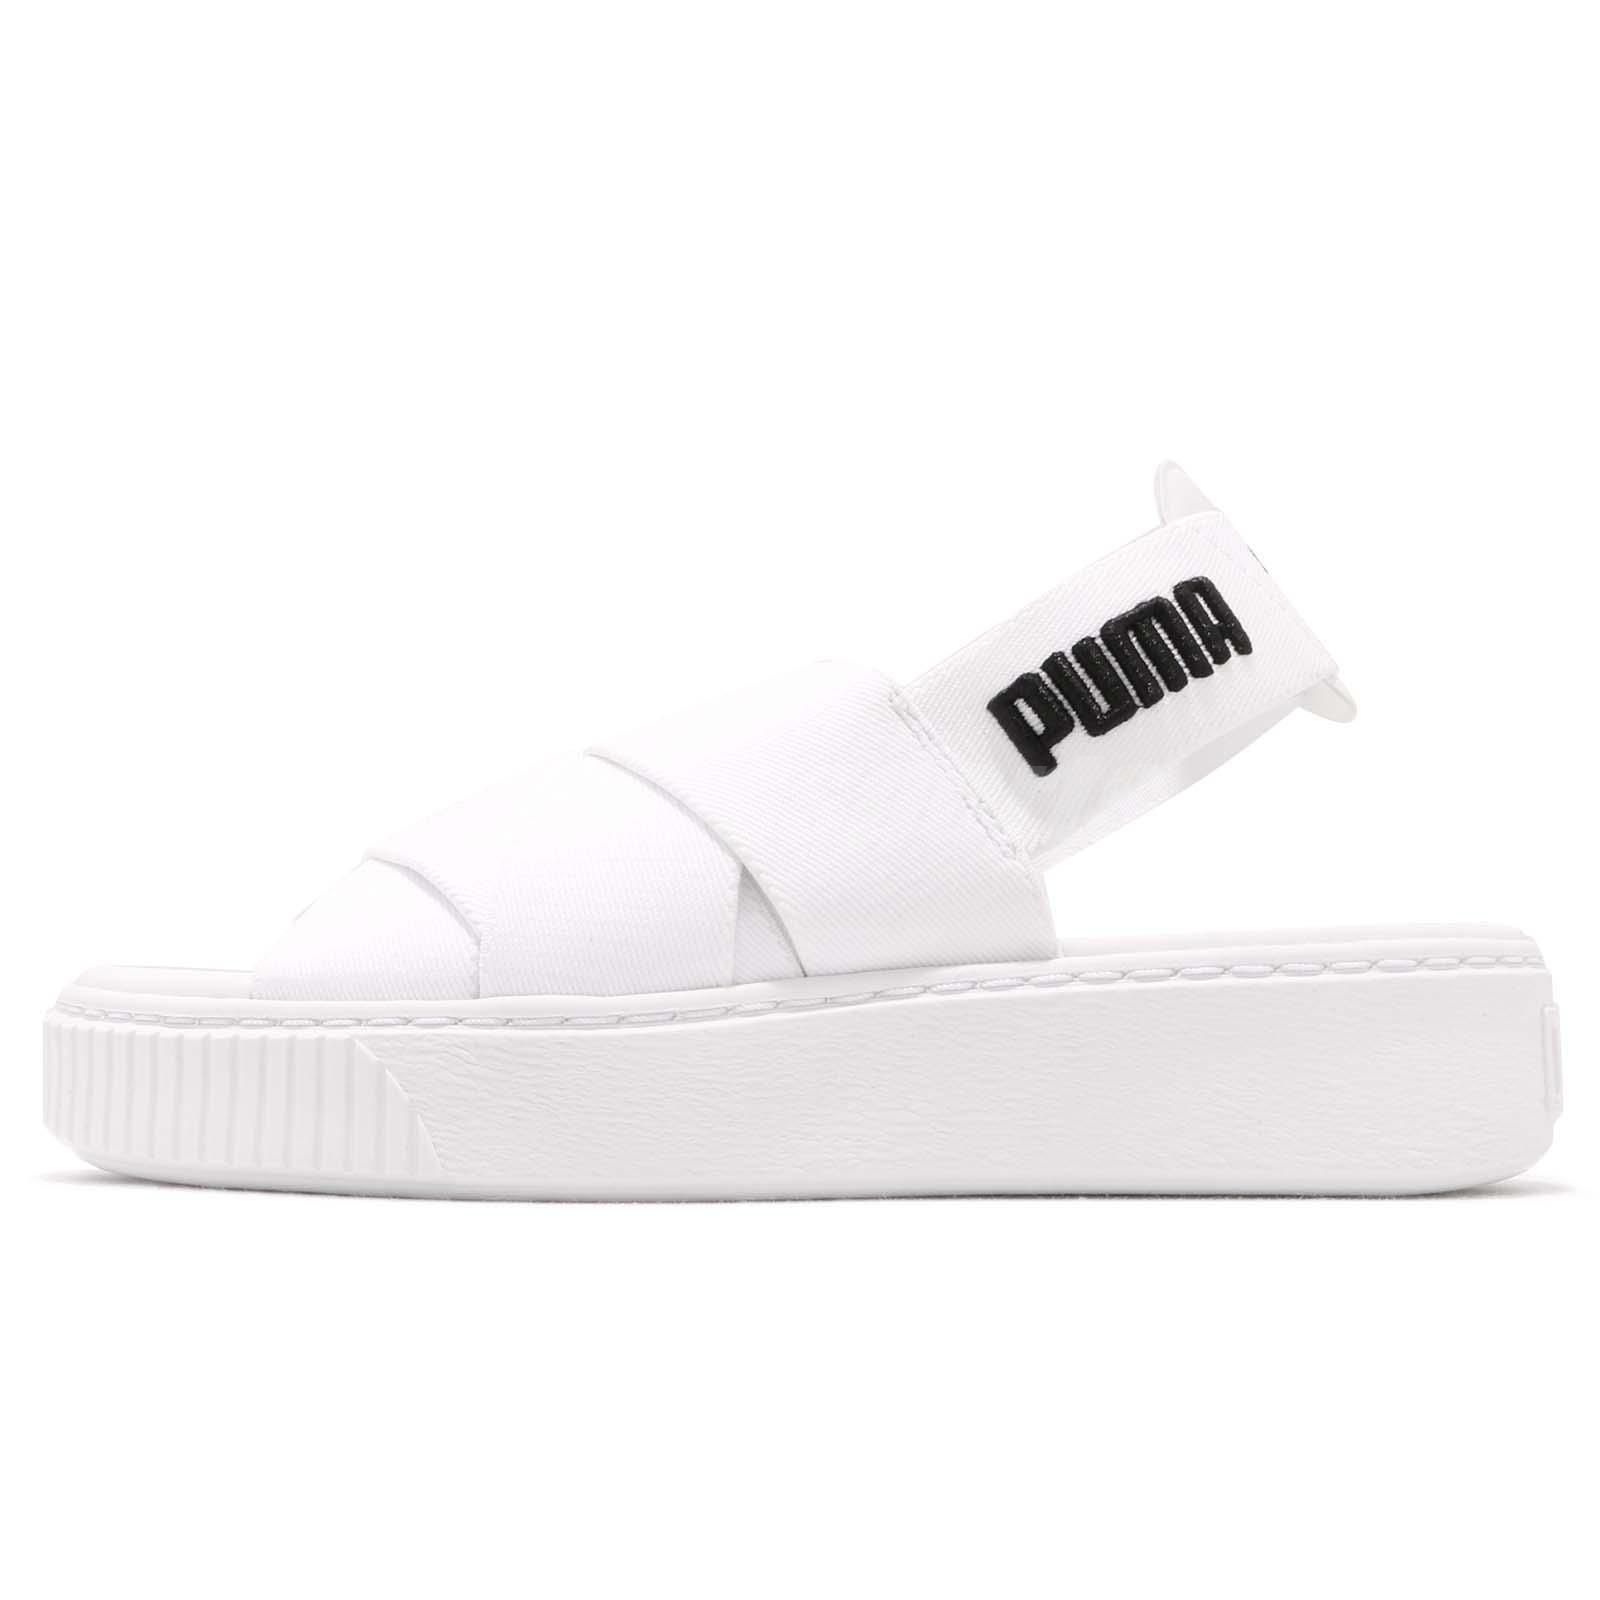 c80700c0e214 Puma Platform Sandal Wns White Black Women Sports Lifestyle Sandal 365478-02